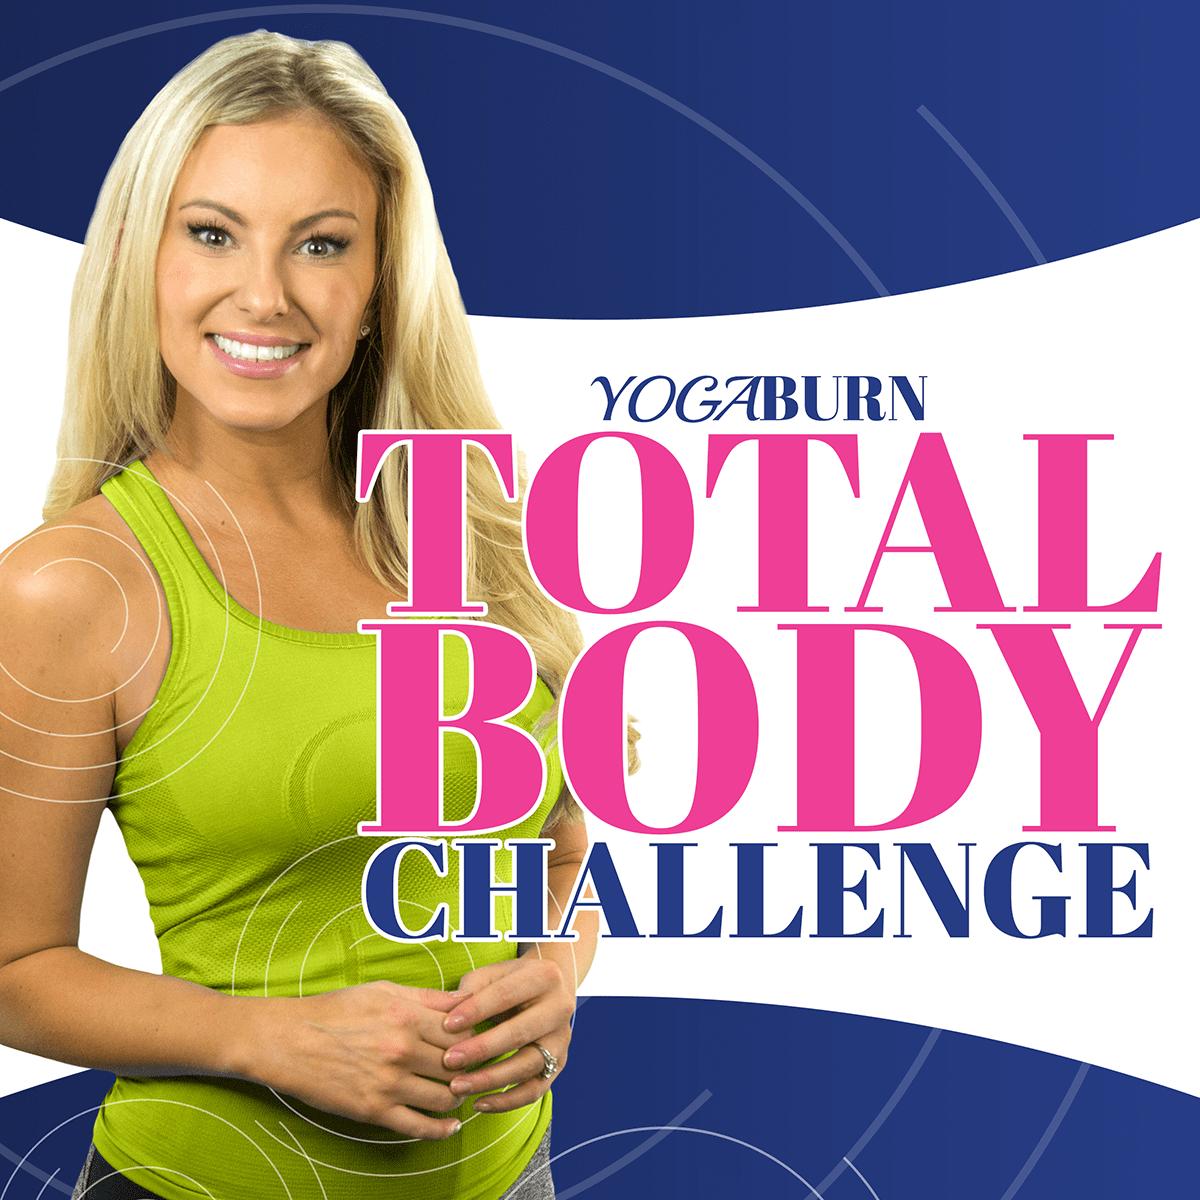 Yogaburn total body challnge